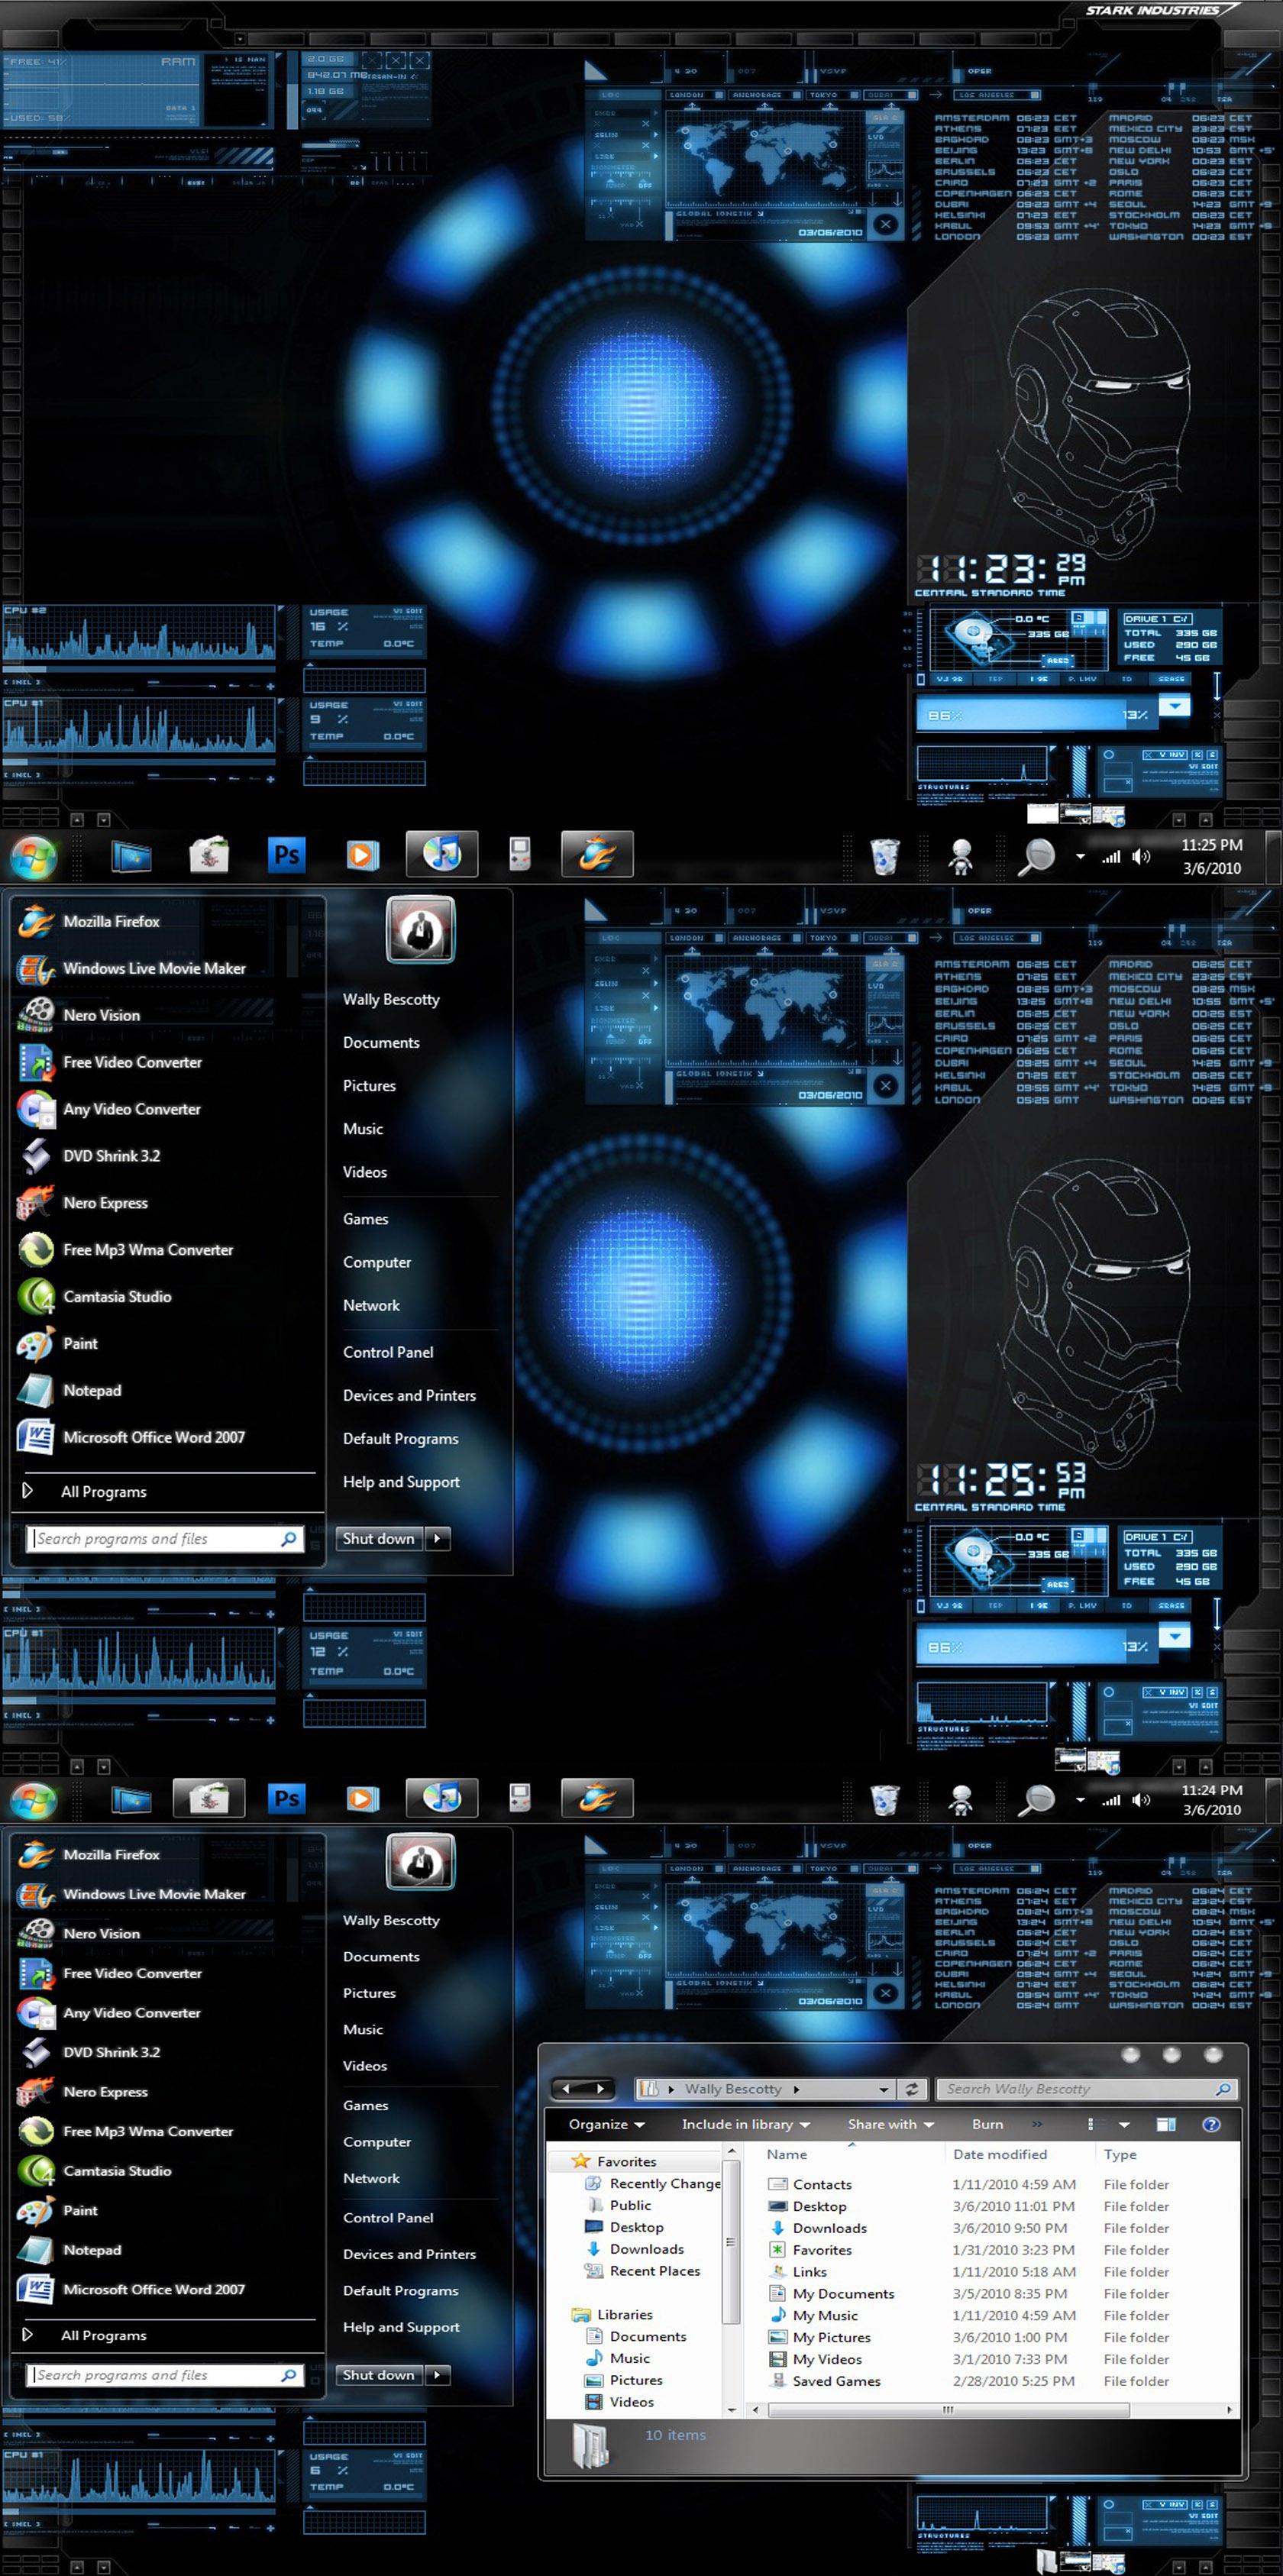 Iron man 2 windows 7 theme latest version 2019 free download.